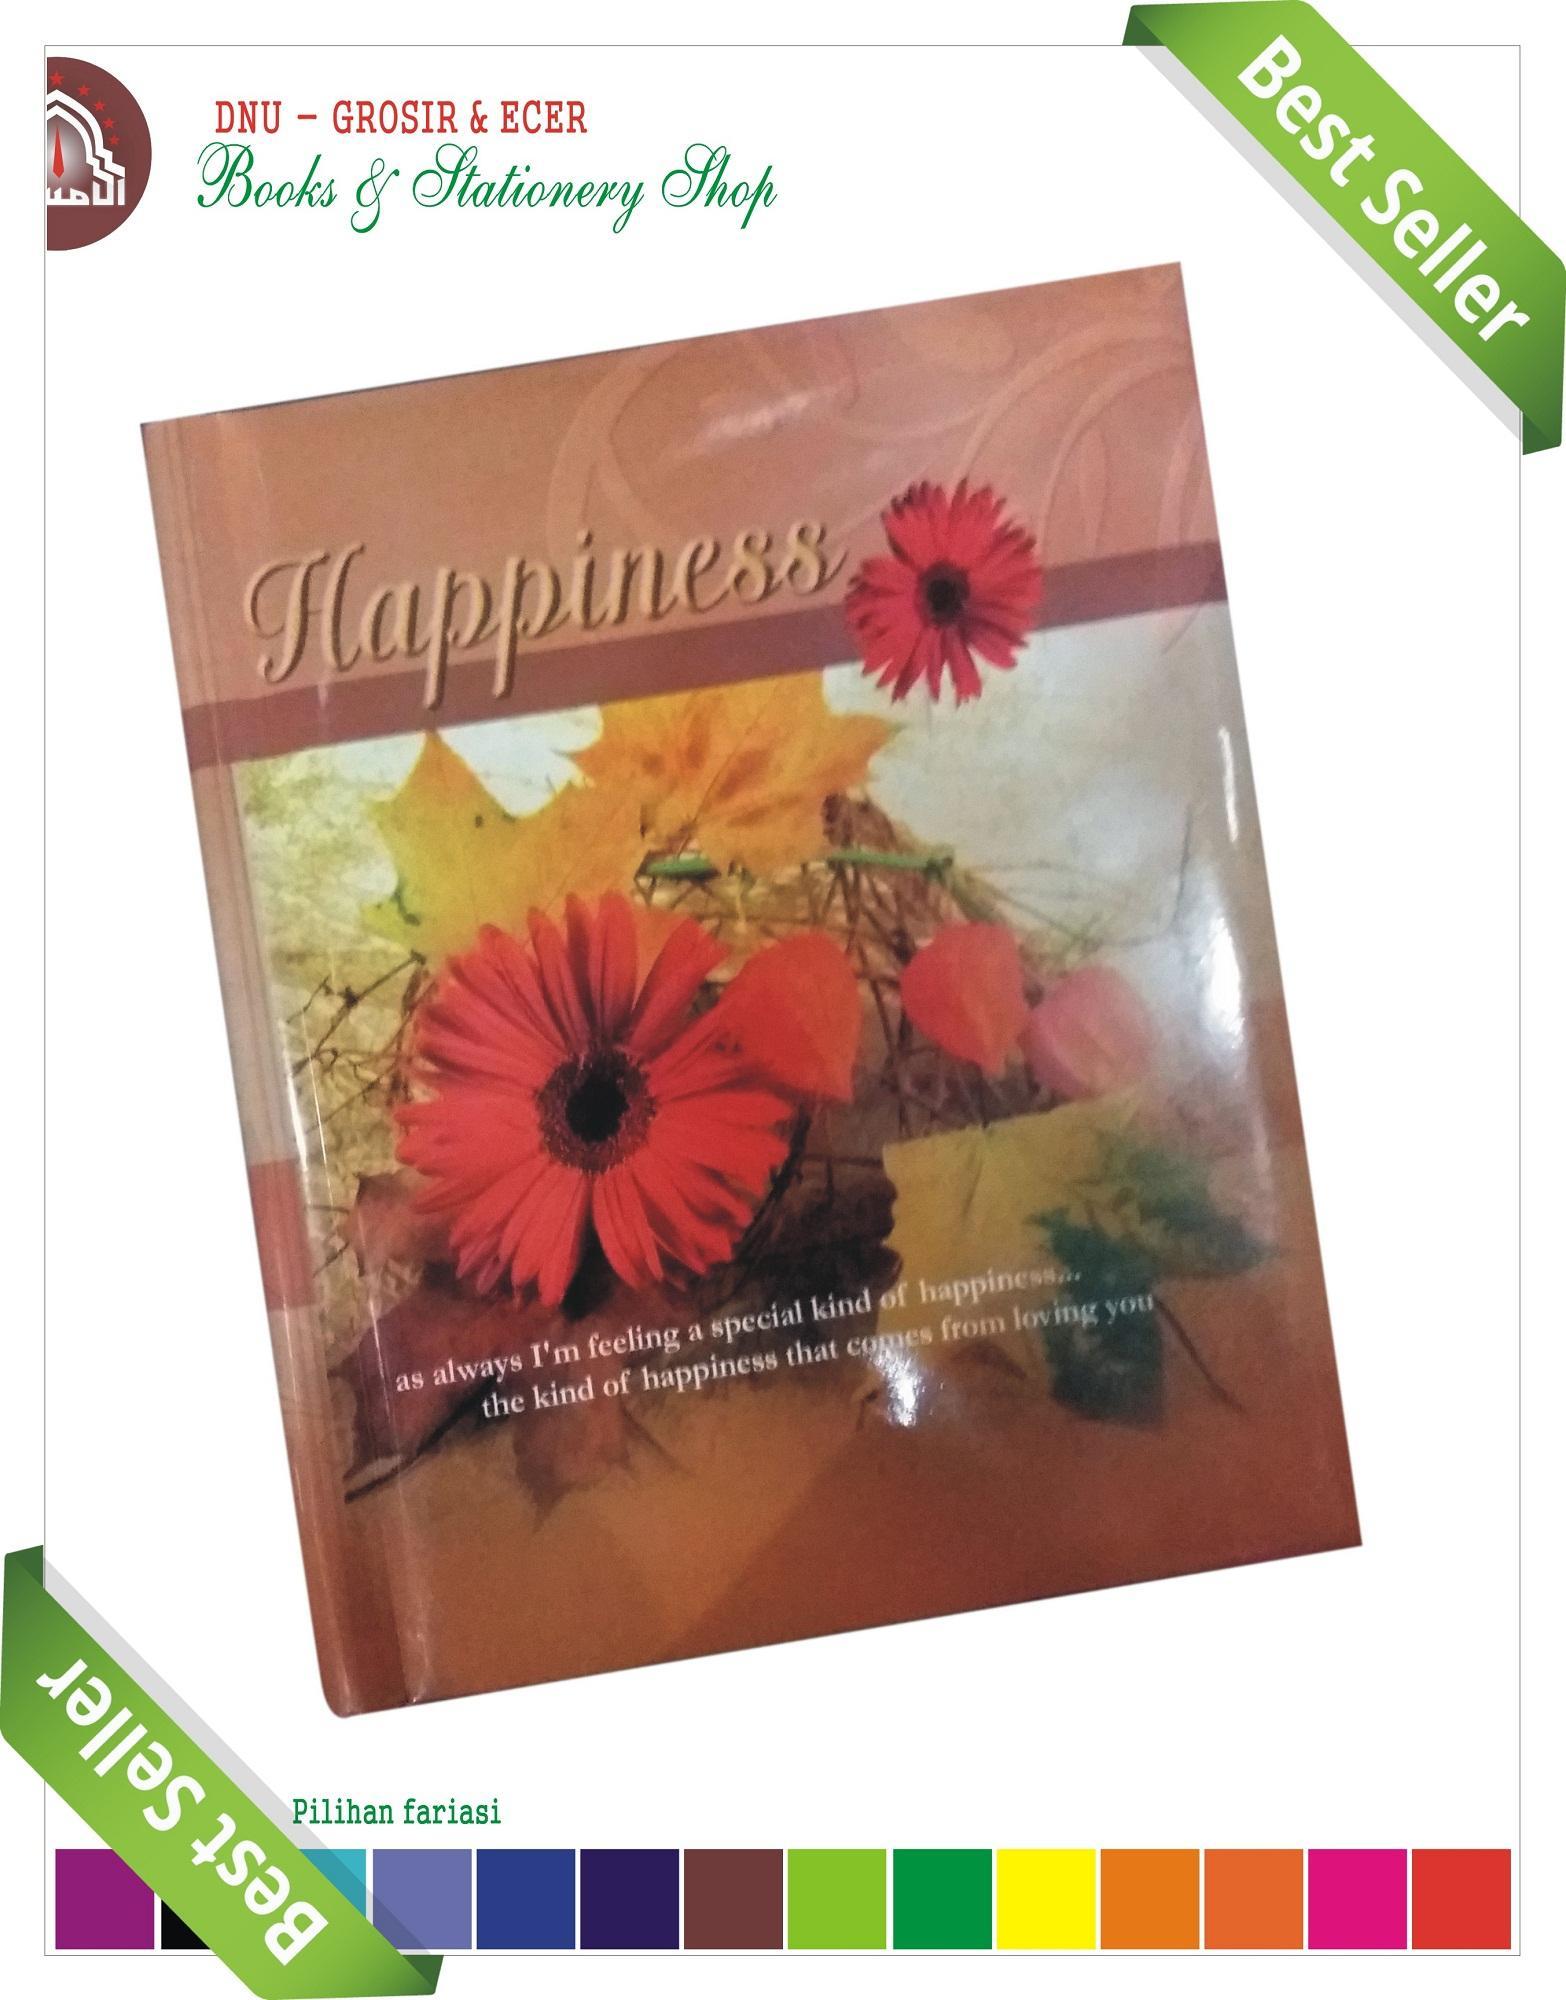 Buy Sell Cheapest 36 Magnetik Jumbo Best Quality Product Deals Album Foto Magentic Doubletone Buku Fhoto Hitam Putih 40x30 Bagus Gratis 3 Pulpen